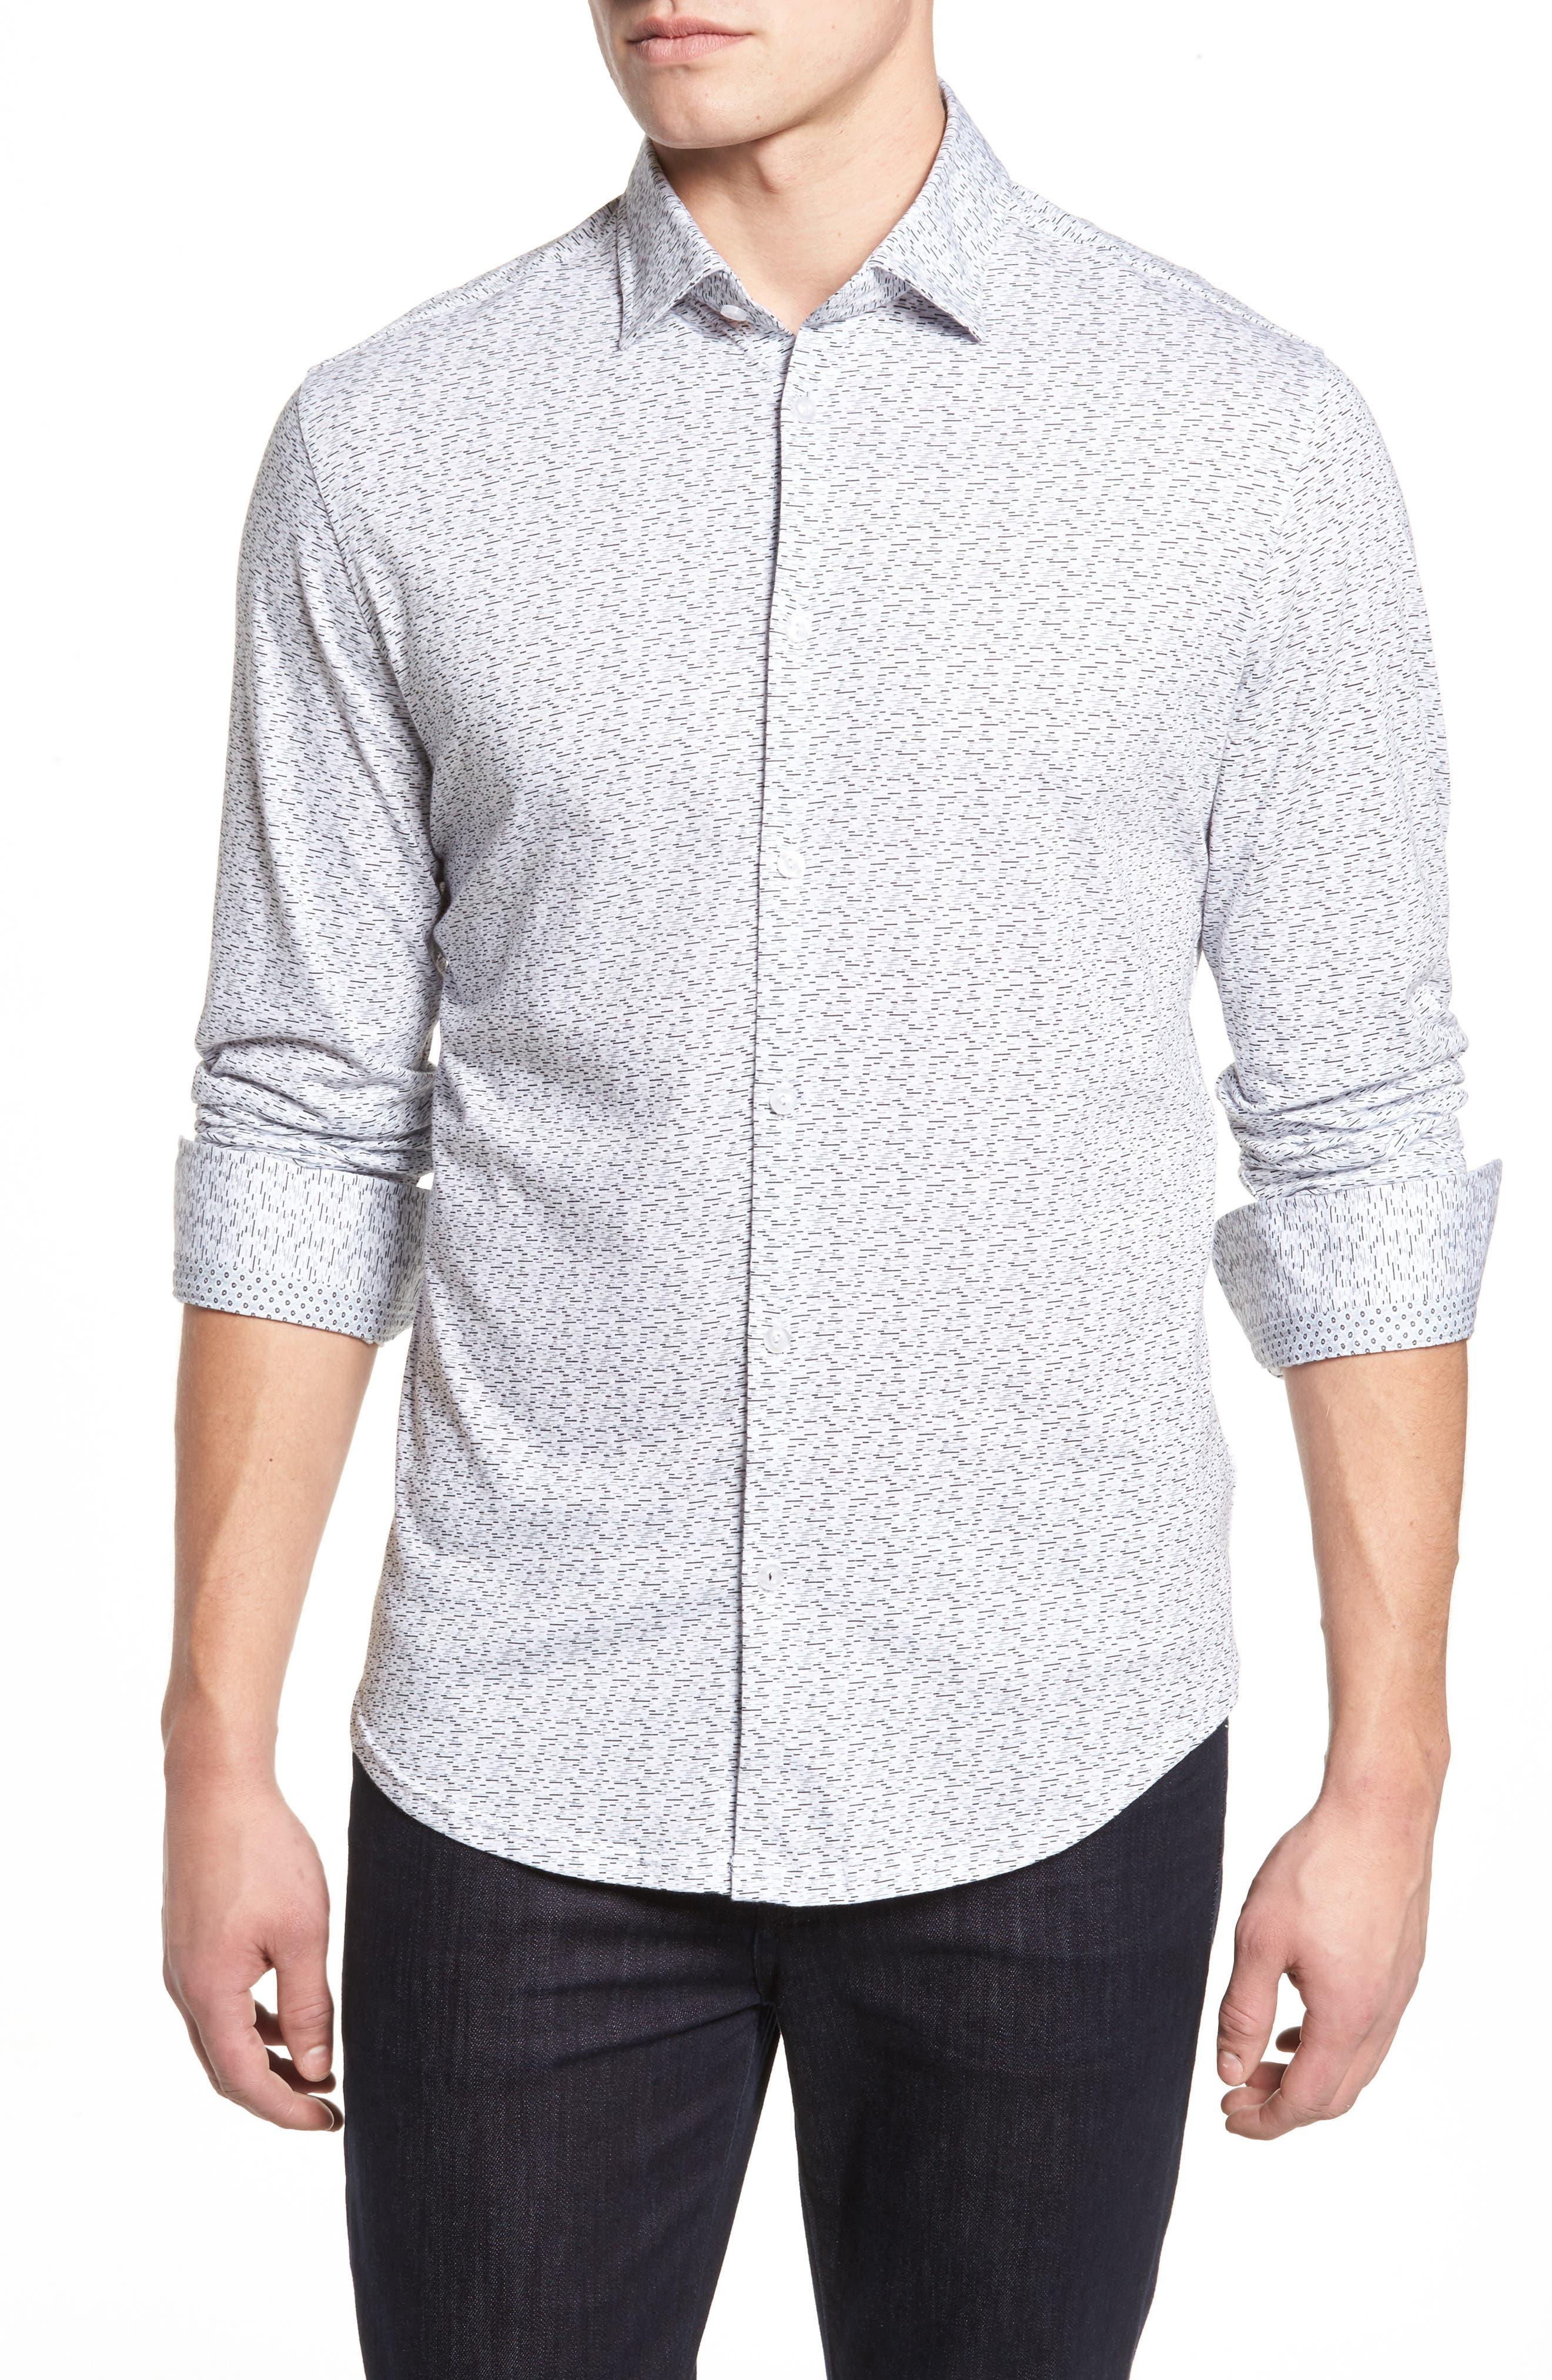 Alternate Image 1 Selected - Stone Rose Slim Fit Print Knit Sport Shirt